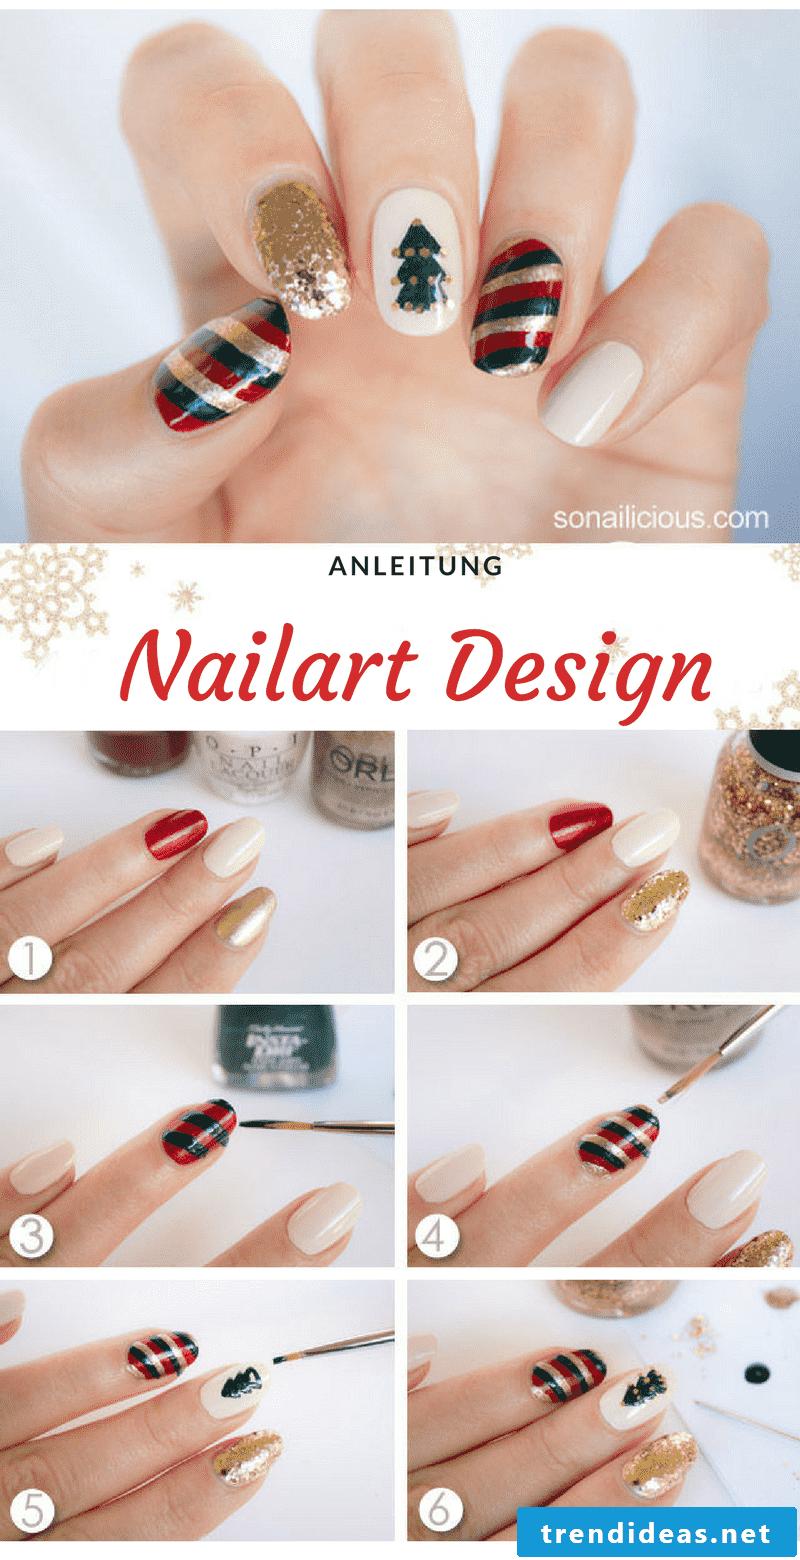 Nail art winter ideas